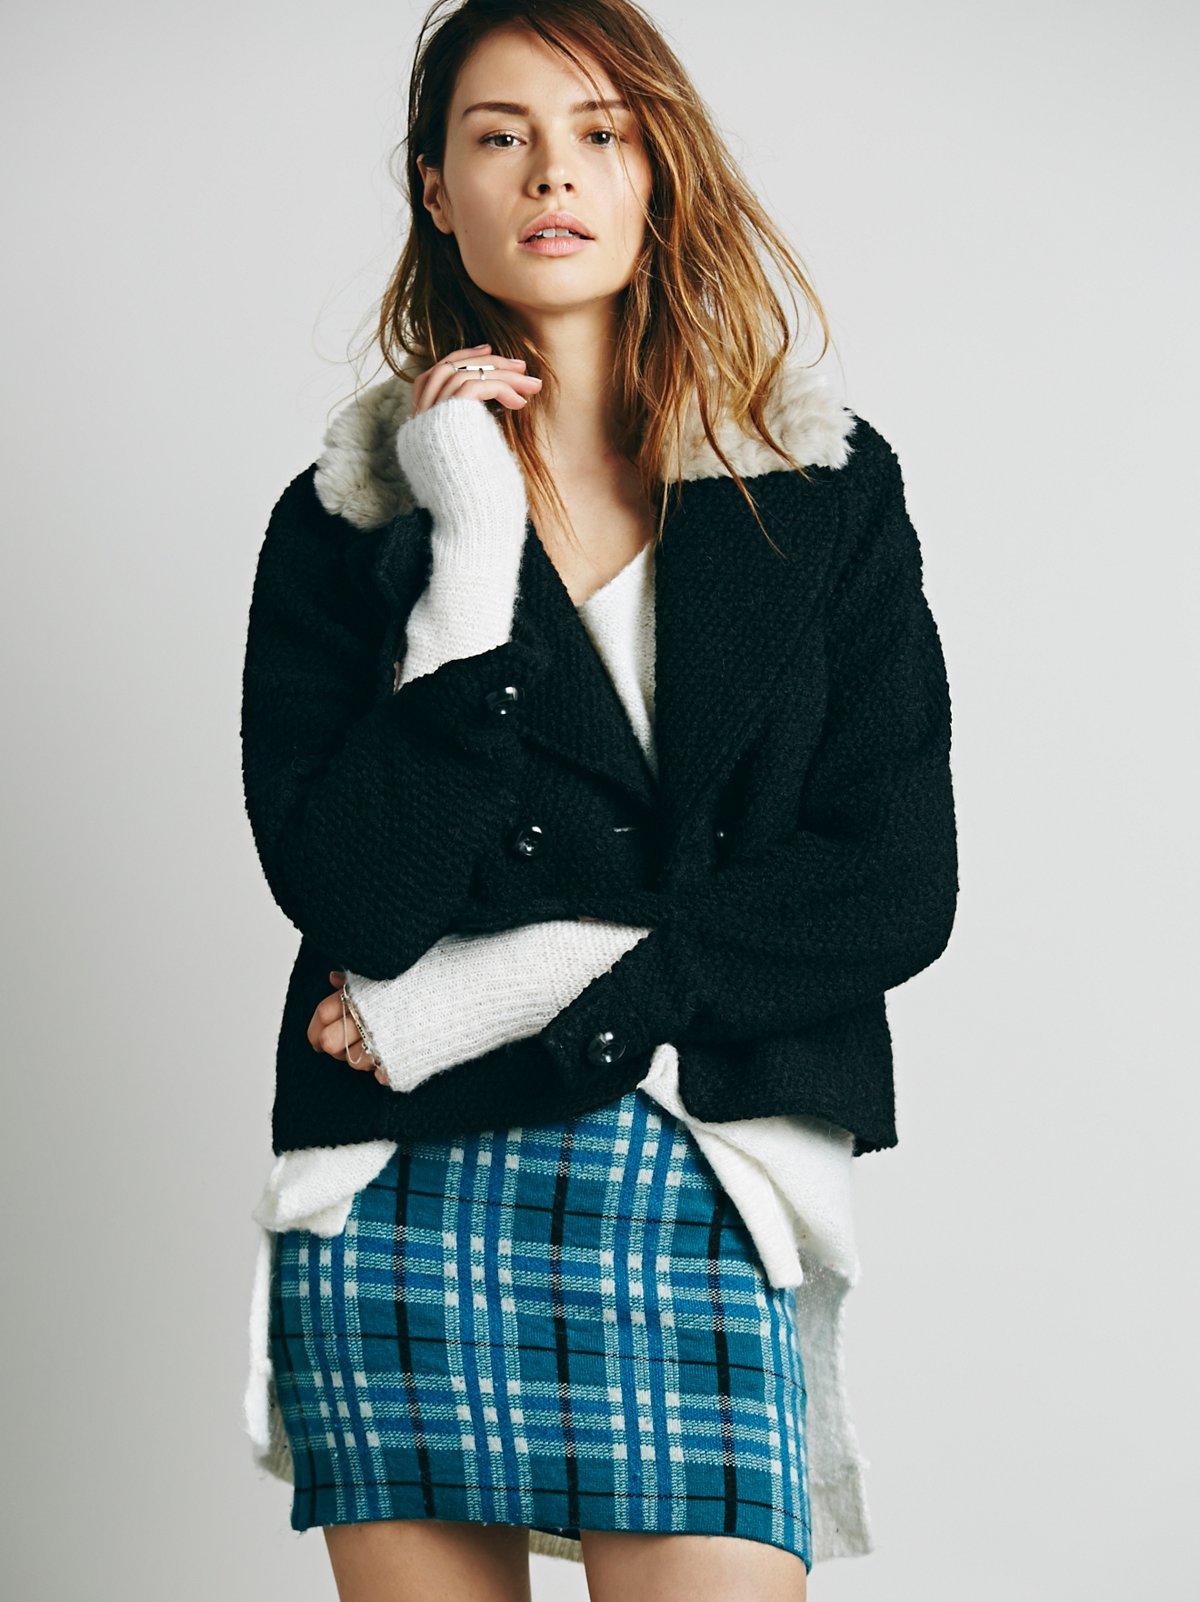 Apre Plaid Sweater Skirt